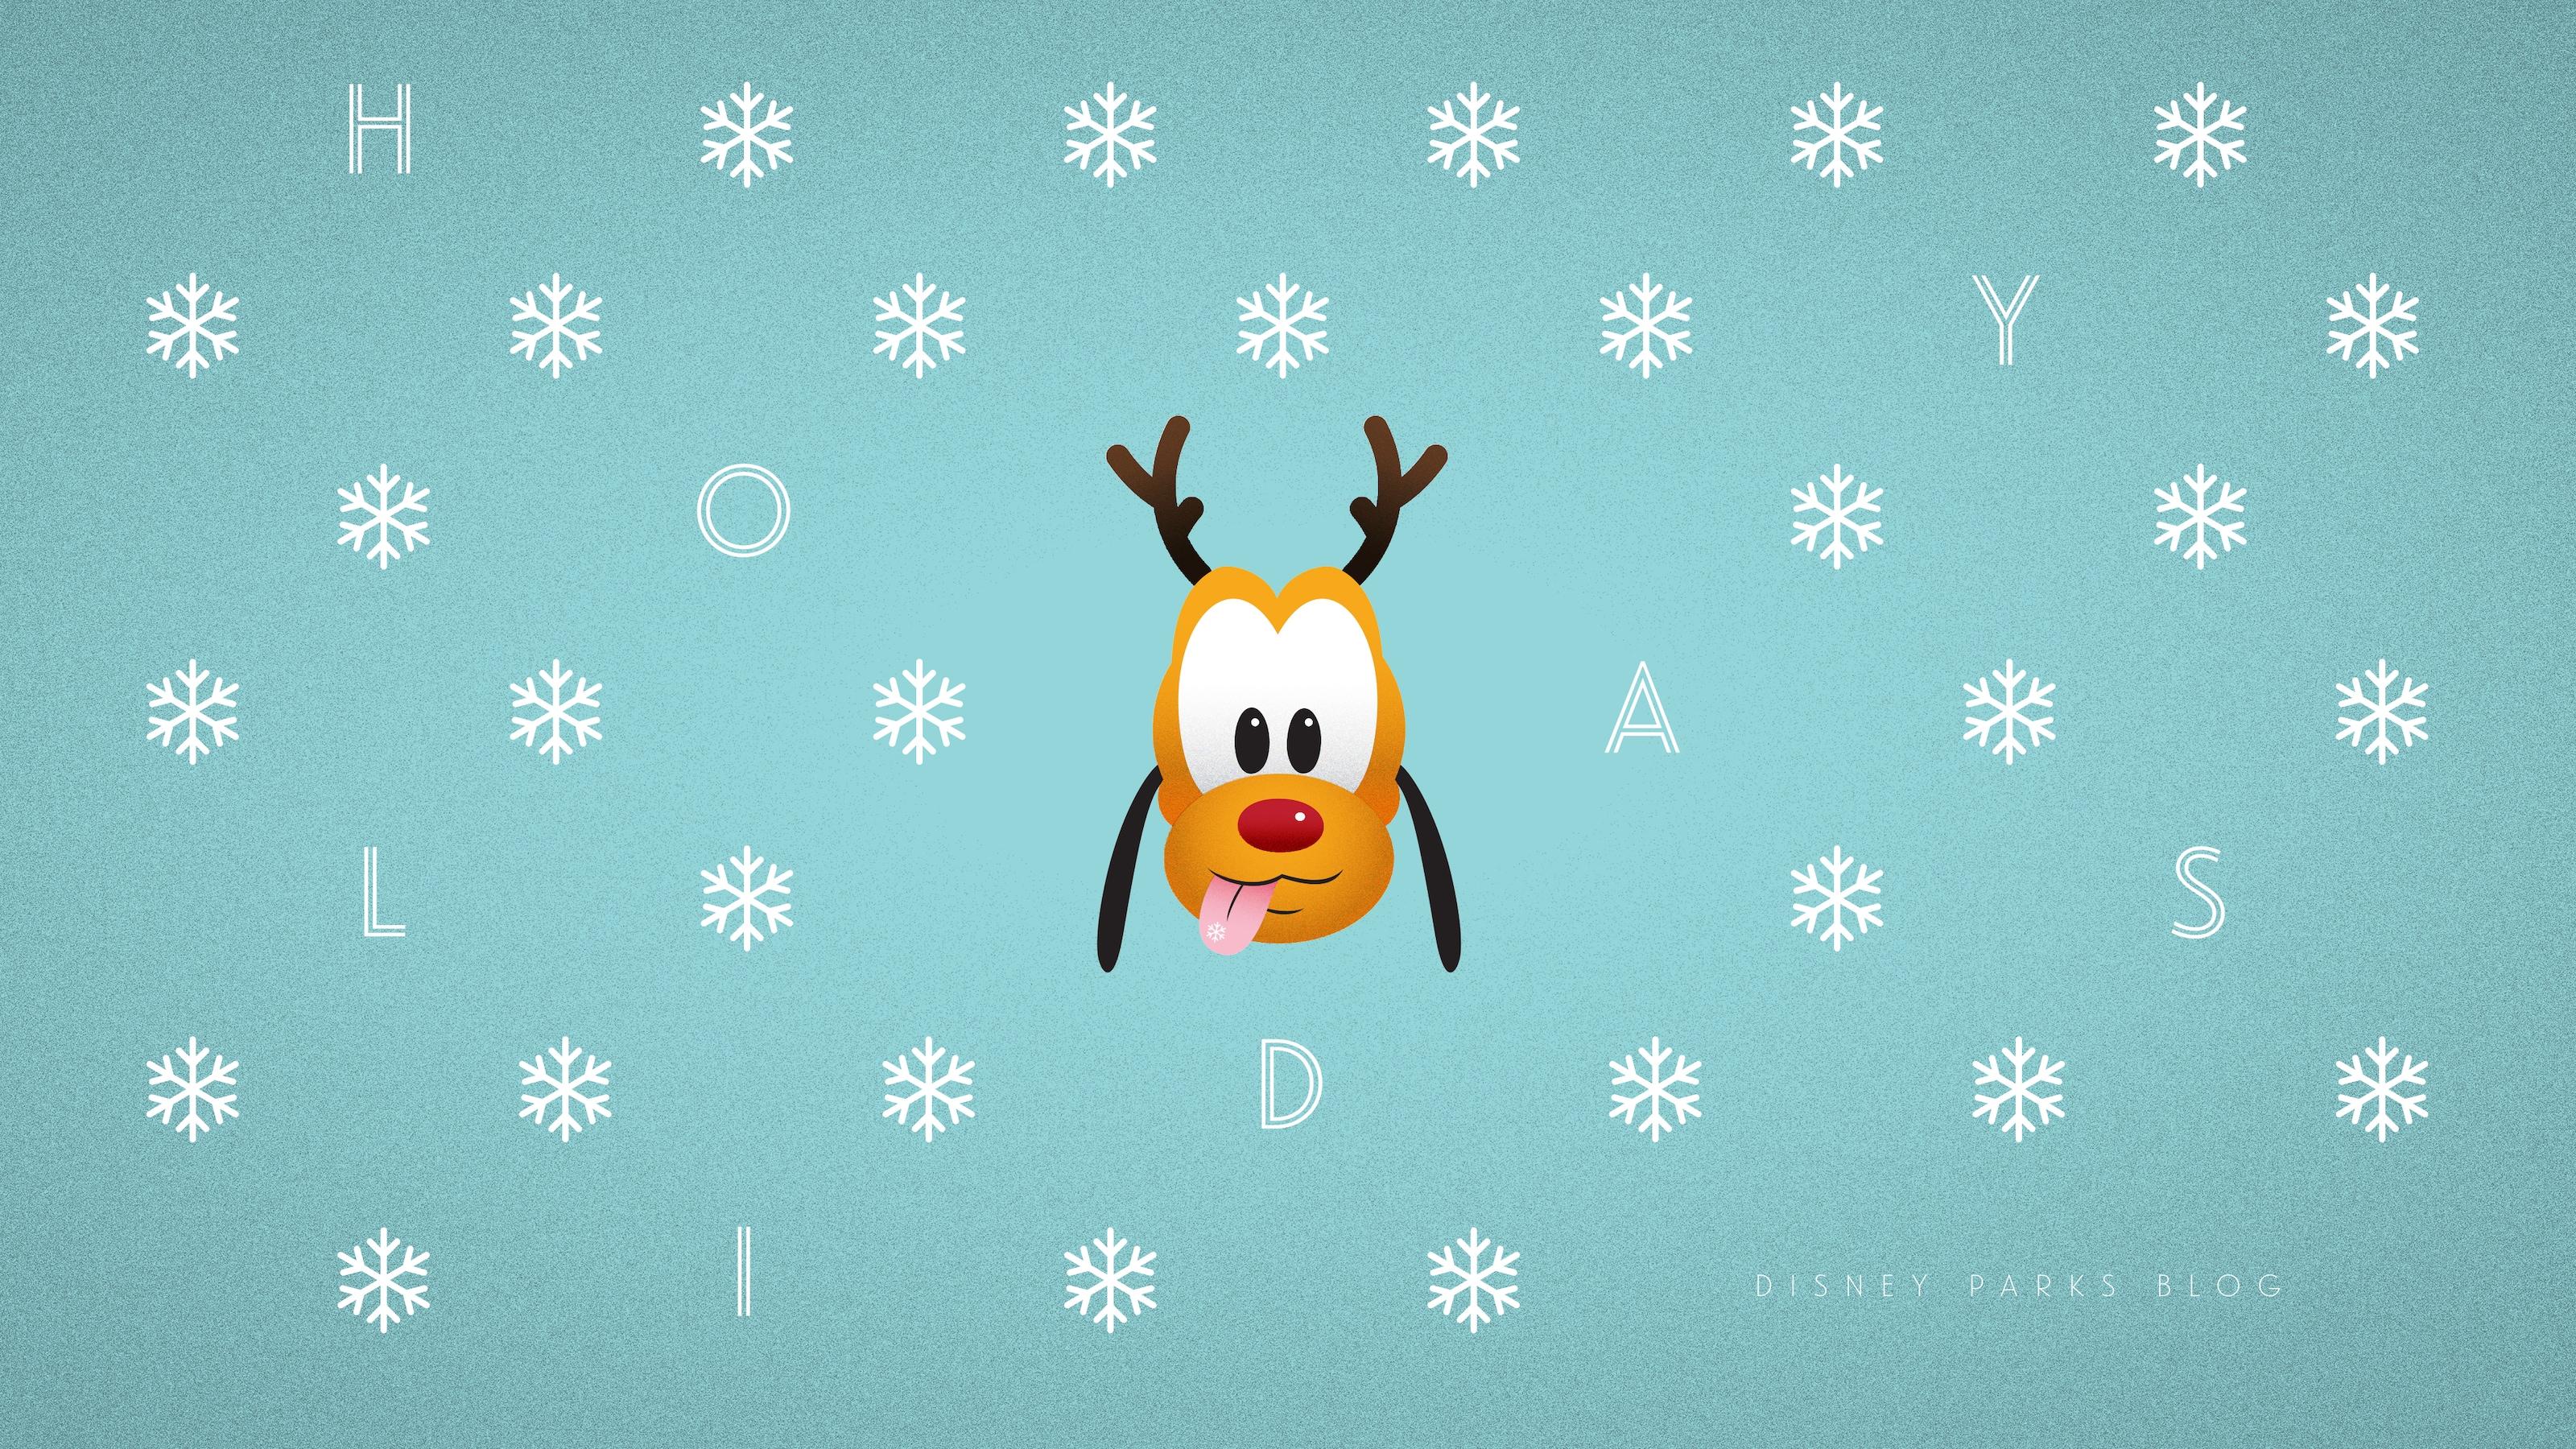 Disney Parks Blog Holiday Wallpaper · Disney Parks Blog Holiday Wallpaper ...